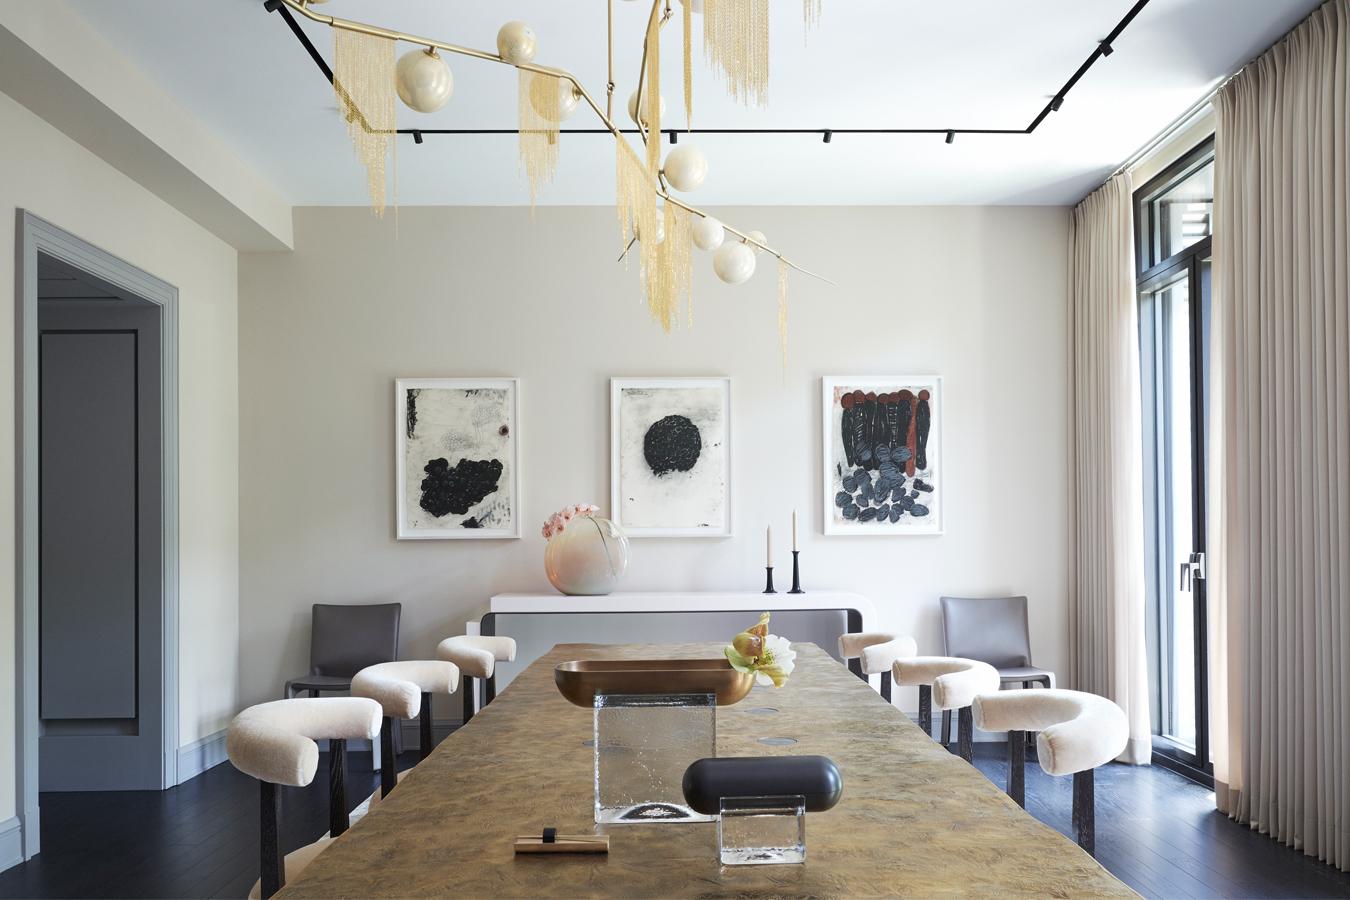 West-Eleventh-Street-dining-room-view-1.jpg